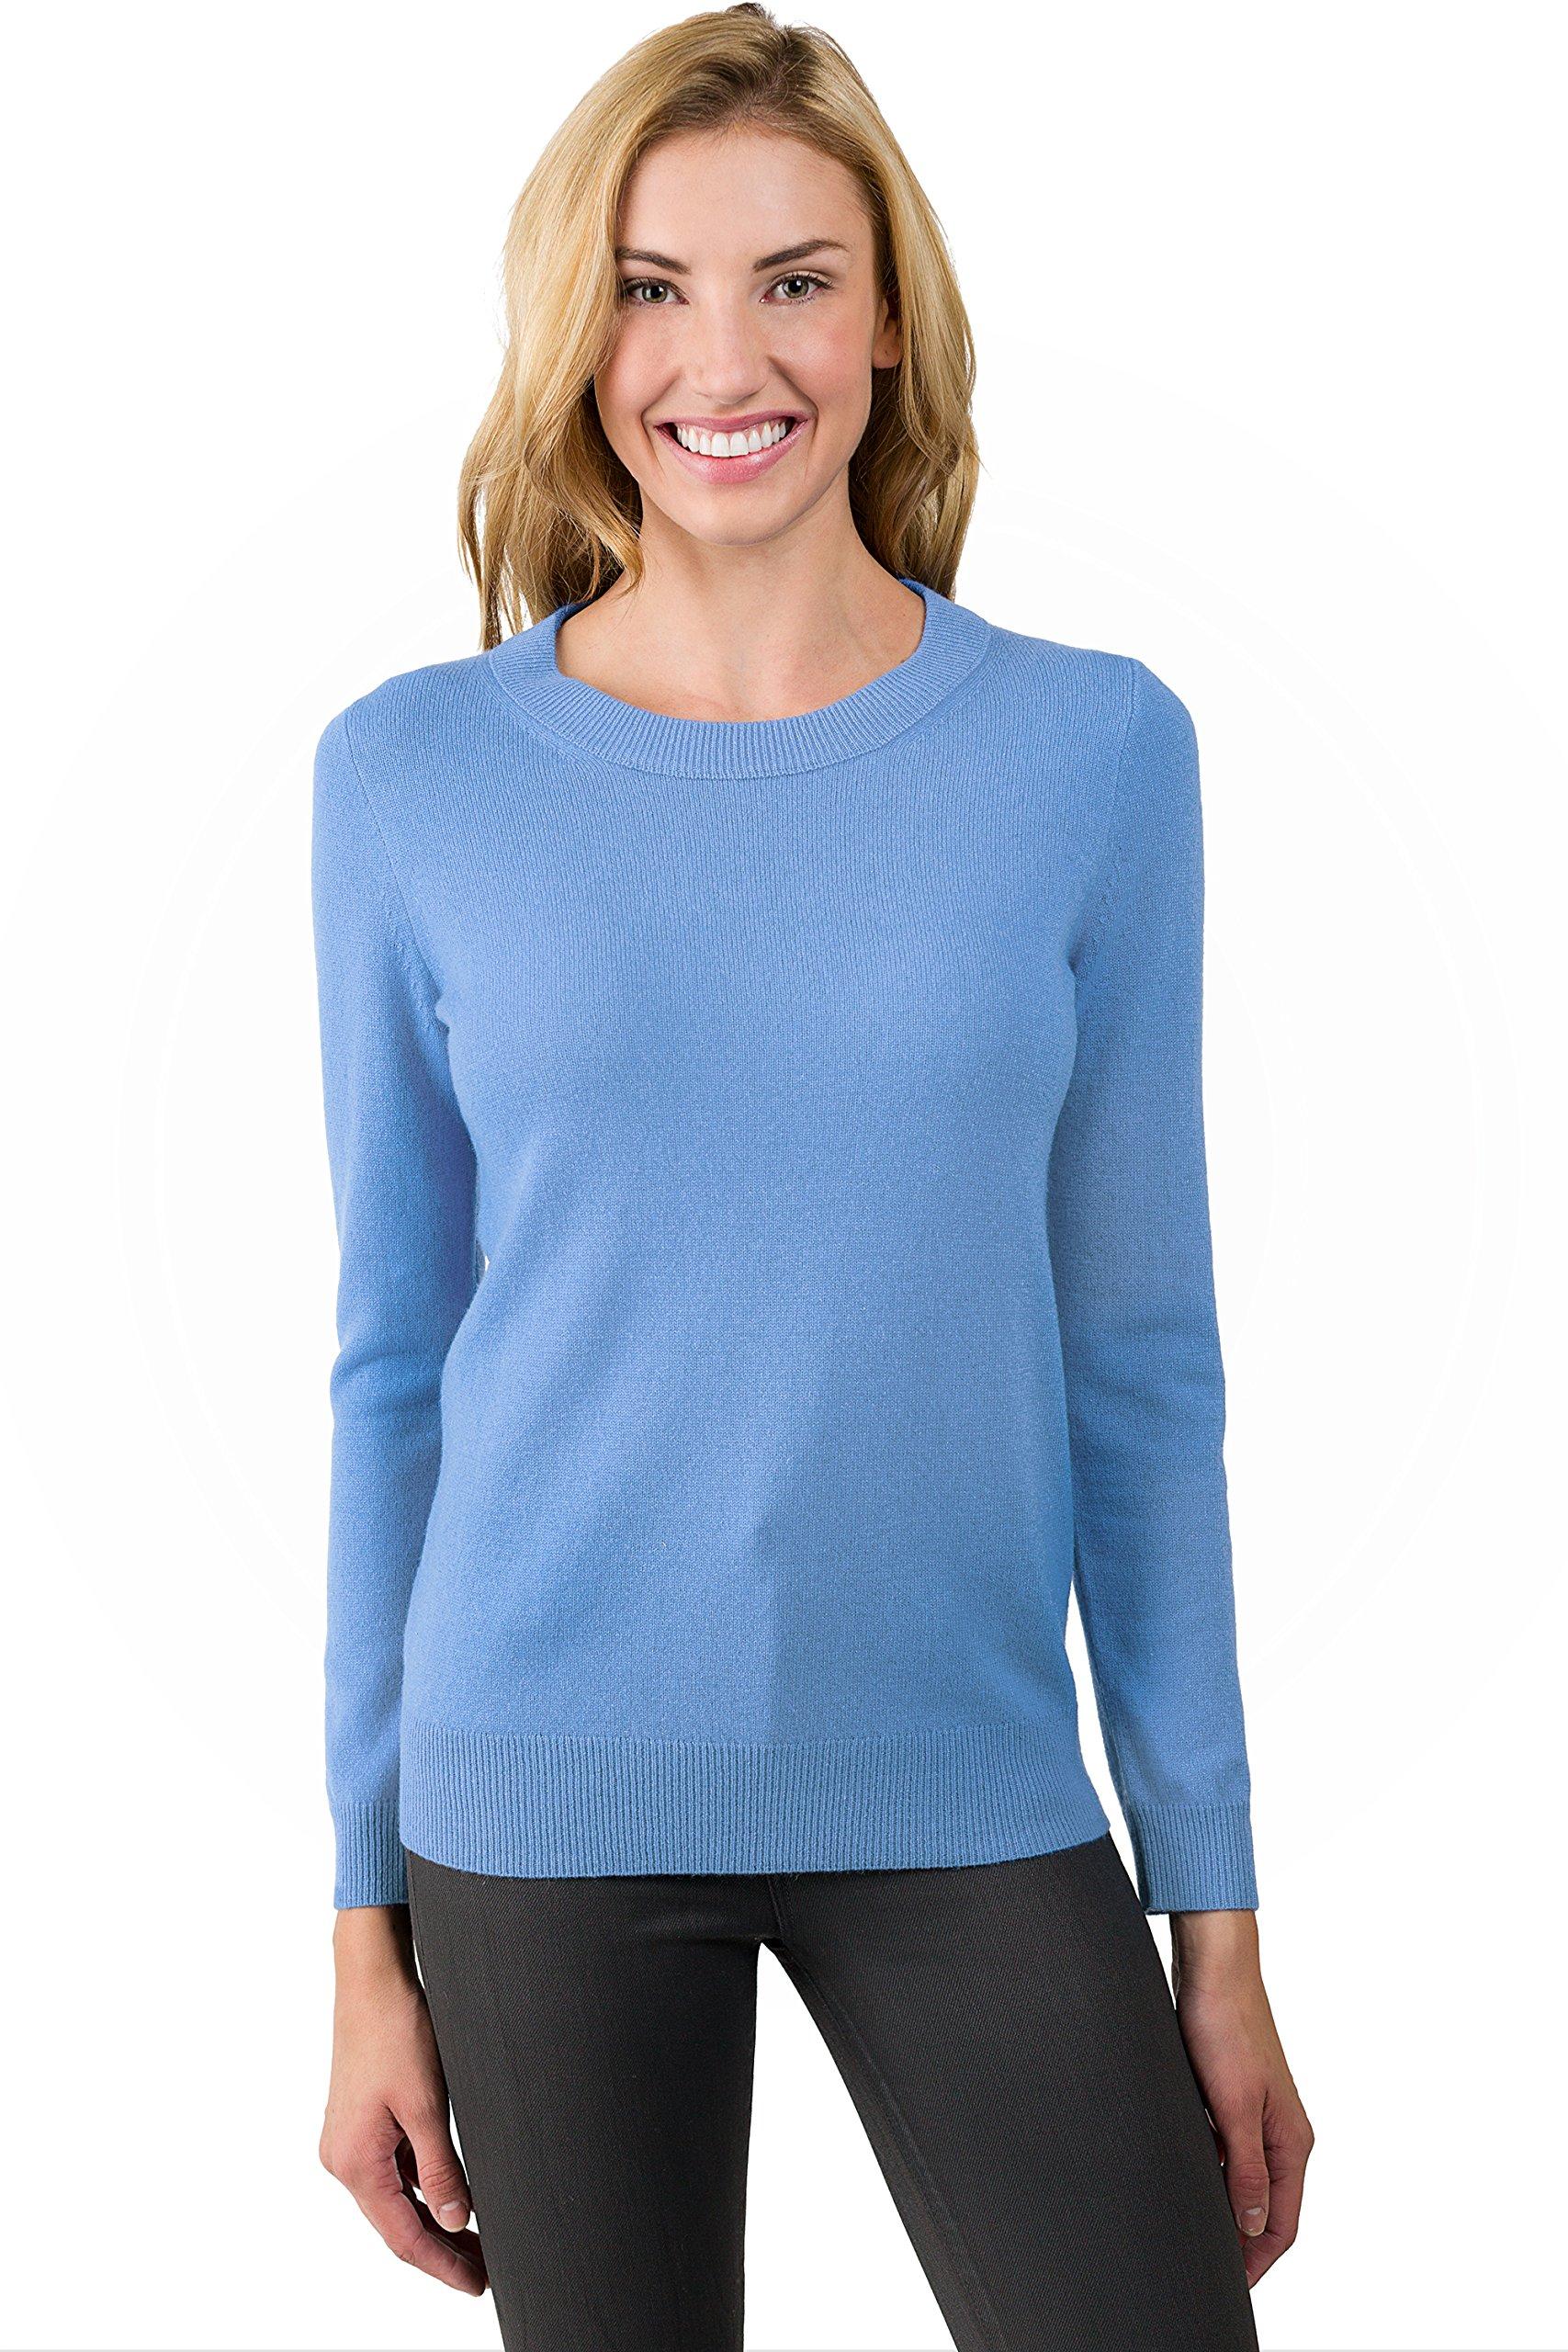 JENNIE LIU Women's 100% Pure Cashmere Long Sleeve Crew Neck Sweater(M, CrystalBlue)